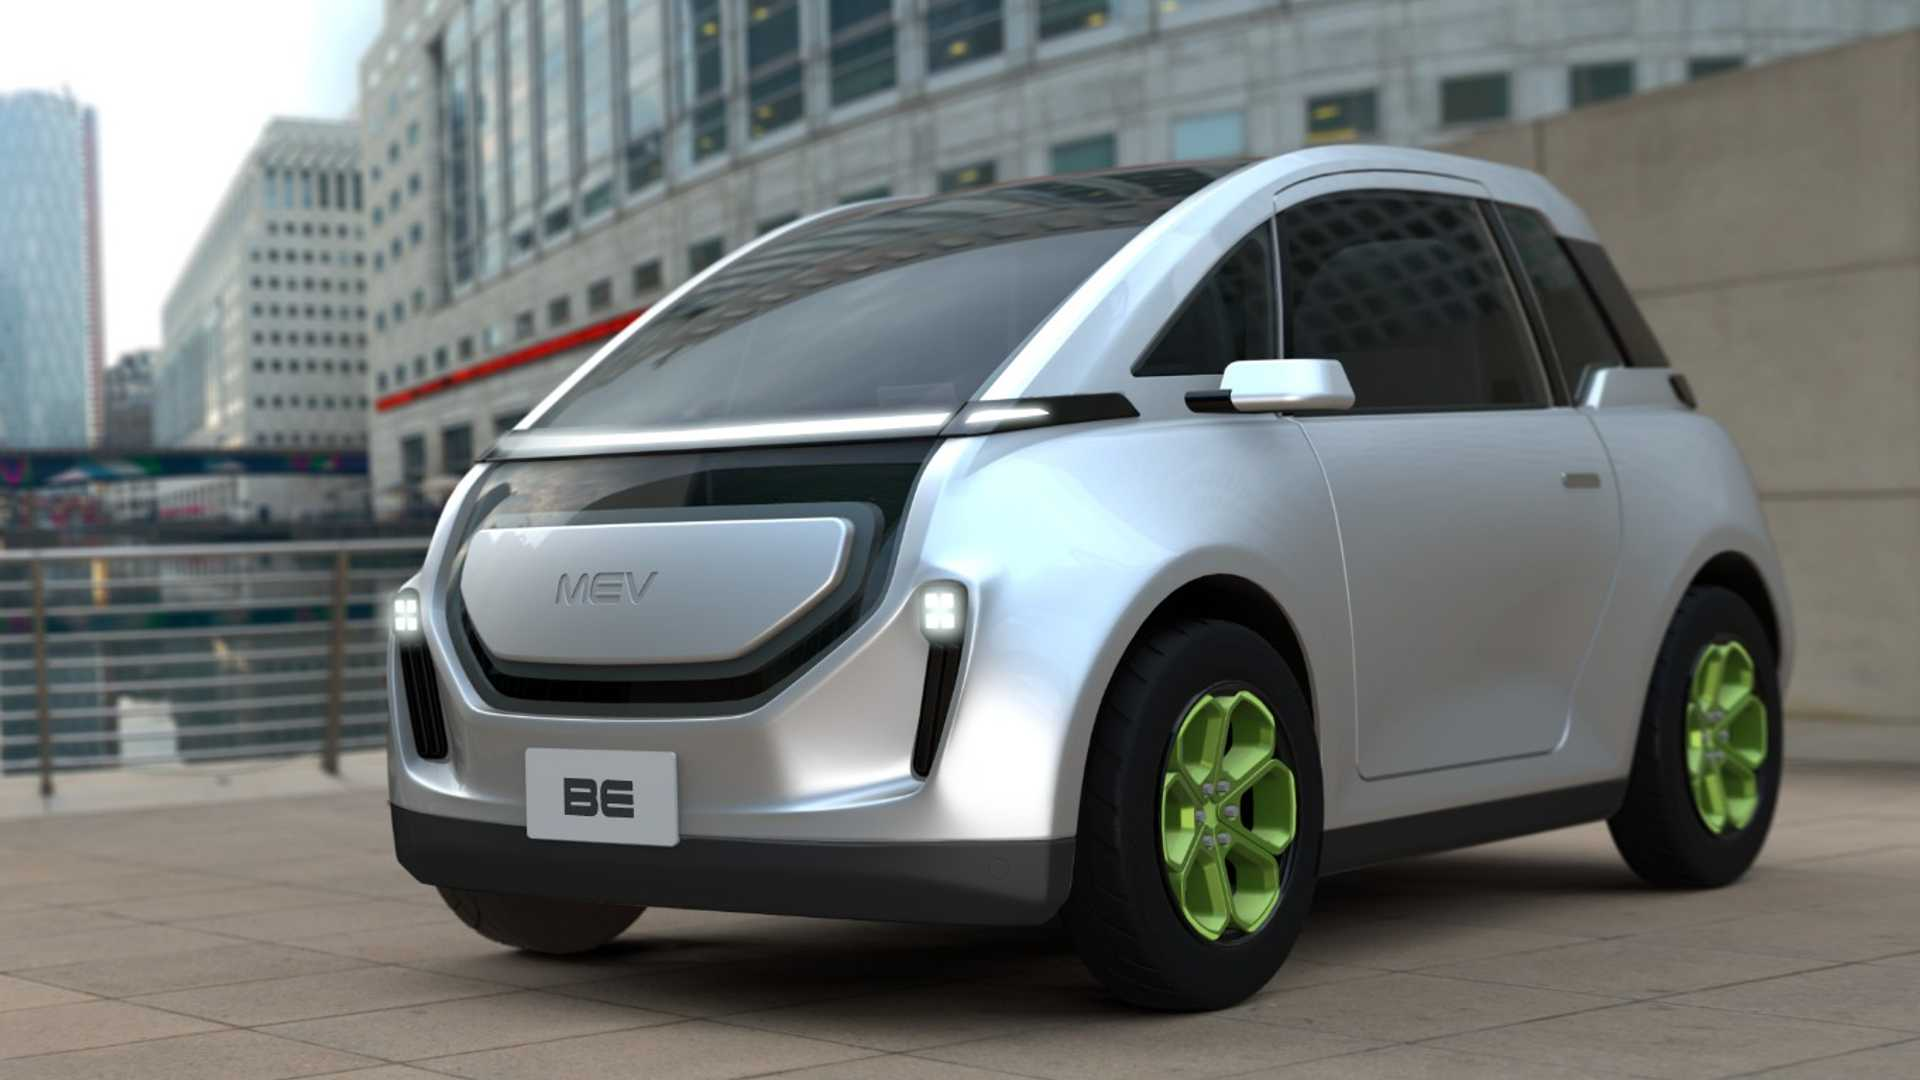 BeeAnywhere: Preiswertes Elektro-Stadtauto aus Manchester